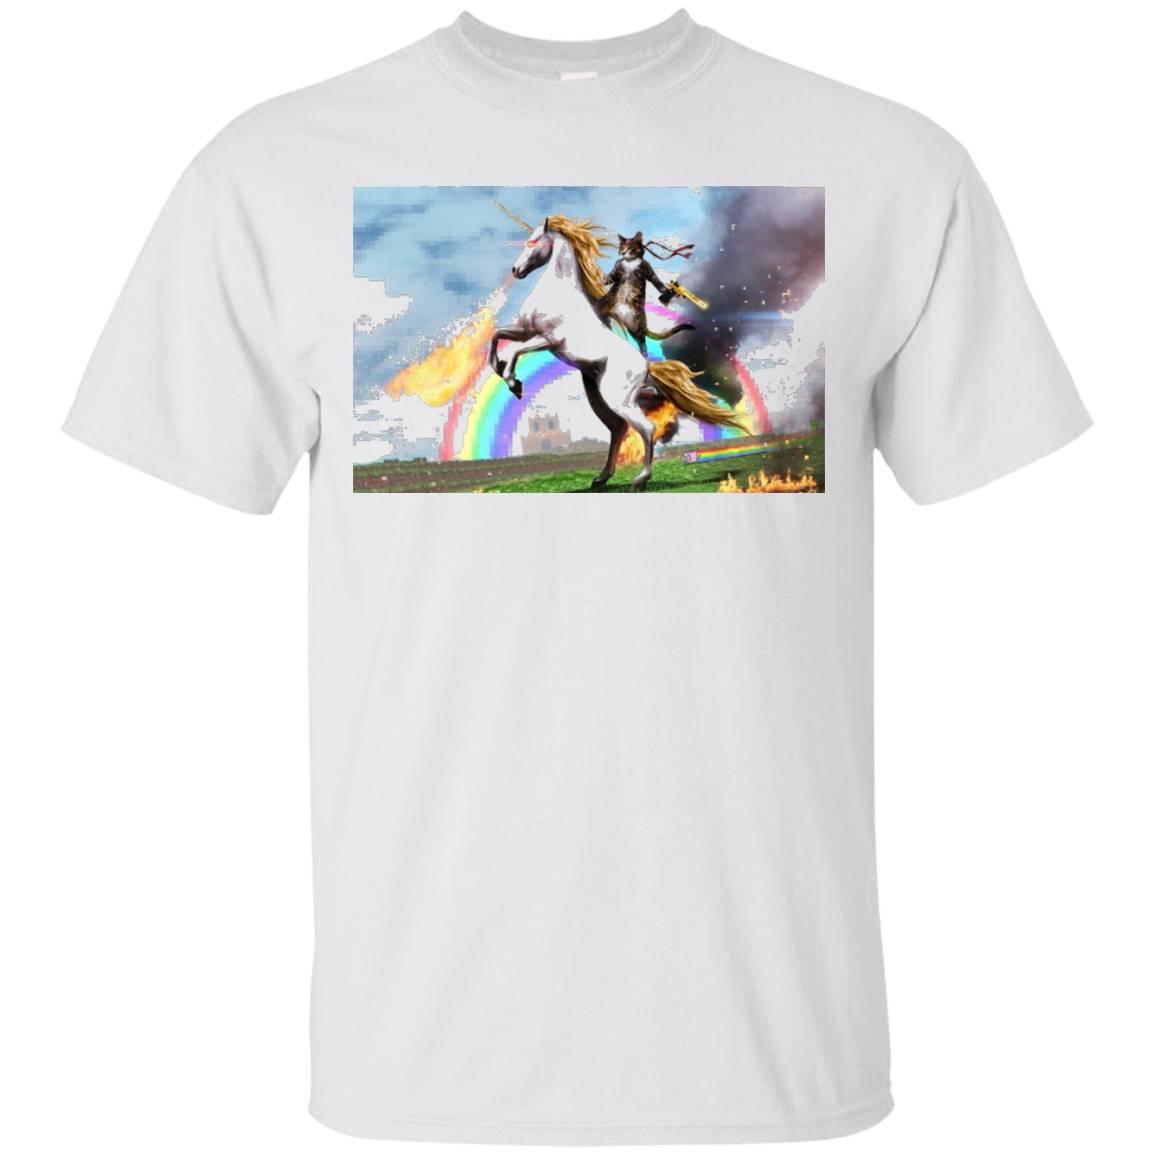 Cat Riding Fire Breathing Unicorn T-Shirt